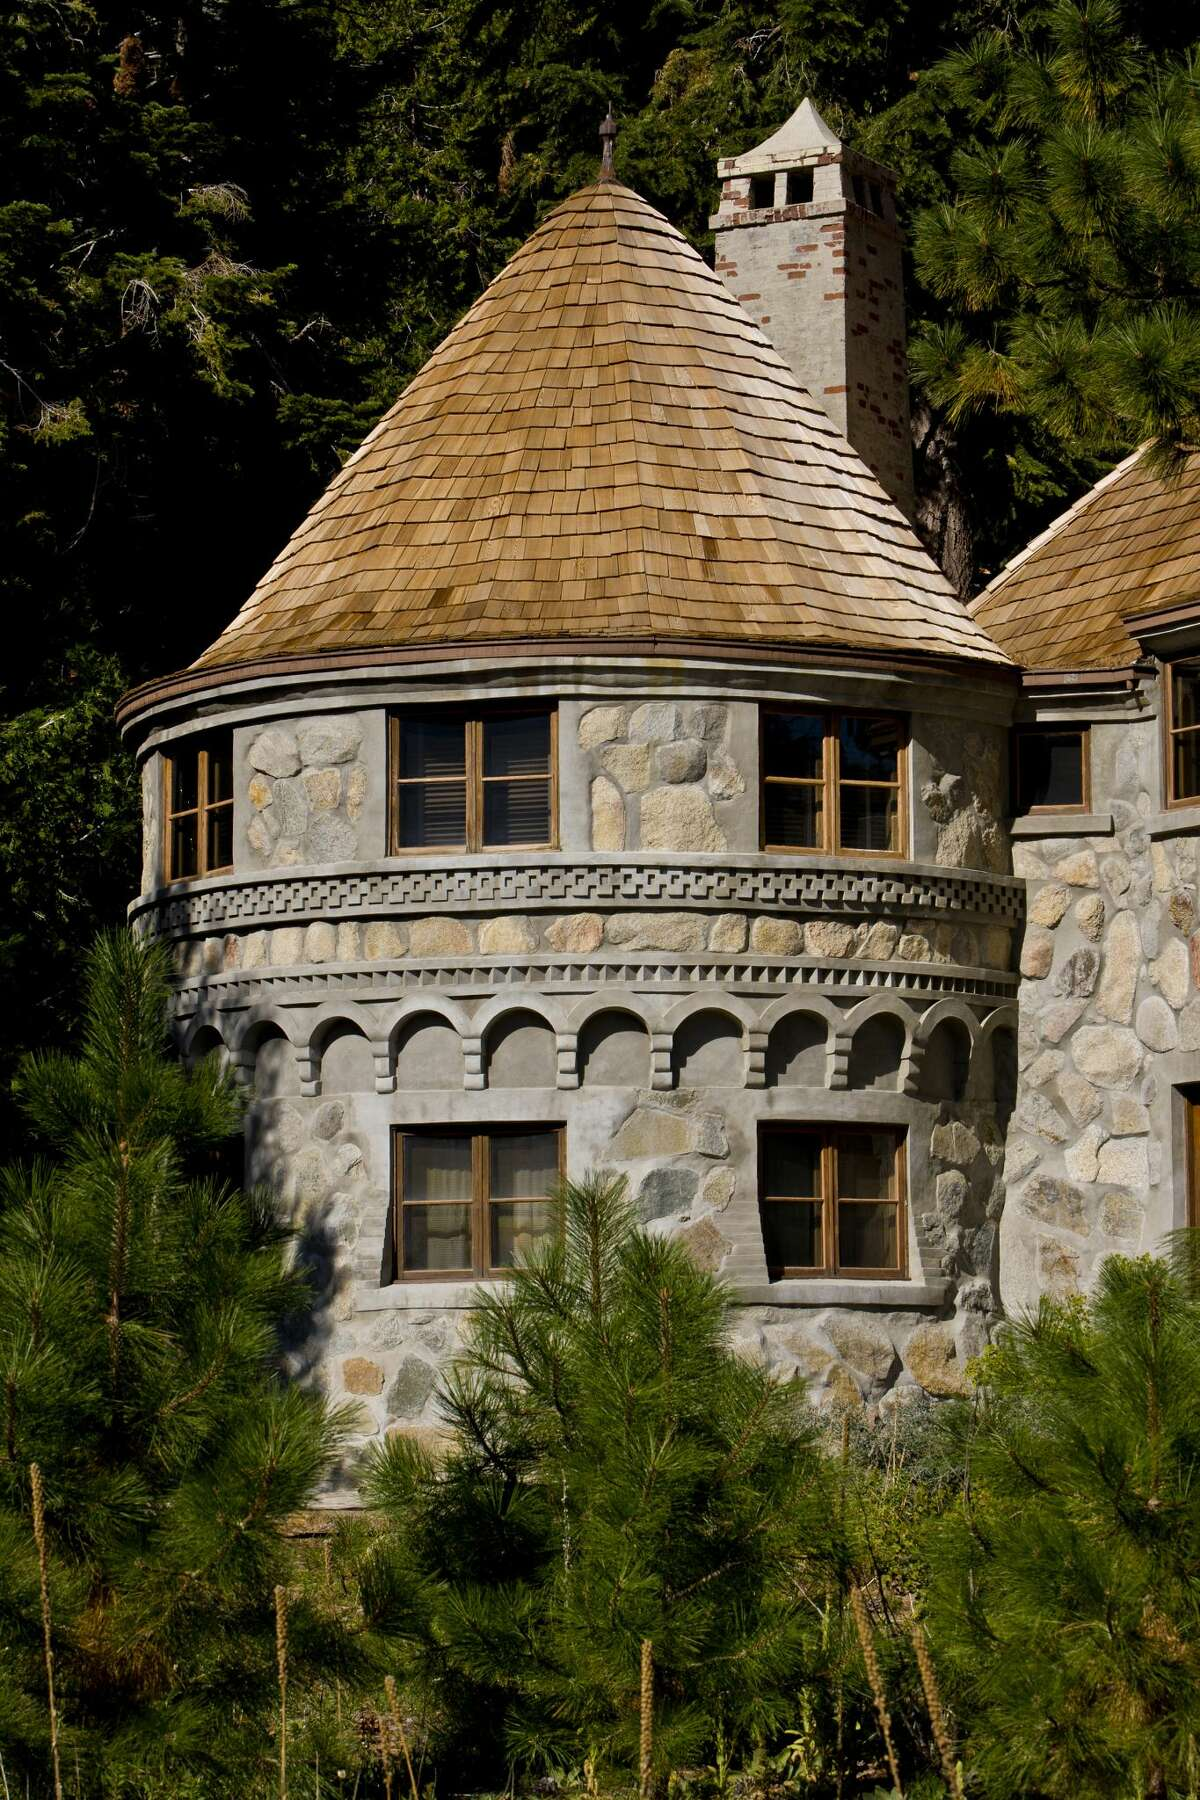 The Vikingsholm castle greets visitors to Emerald Bay.